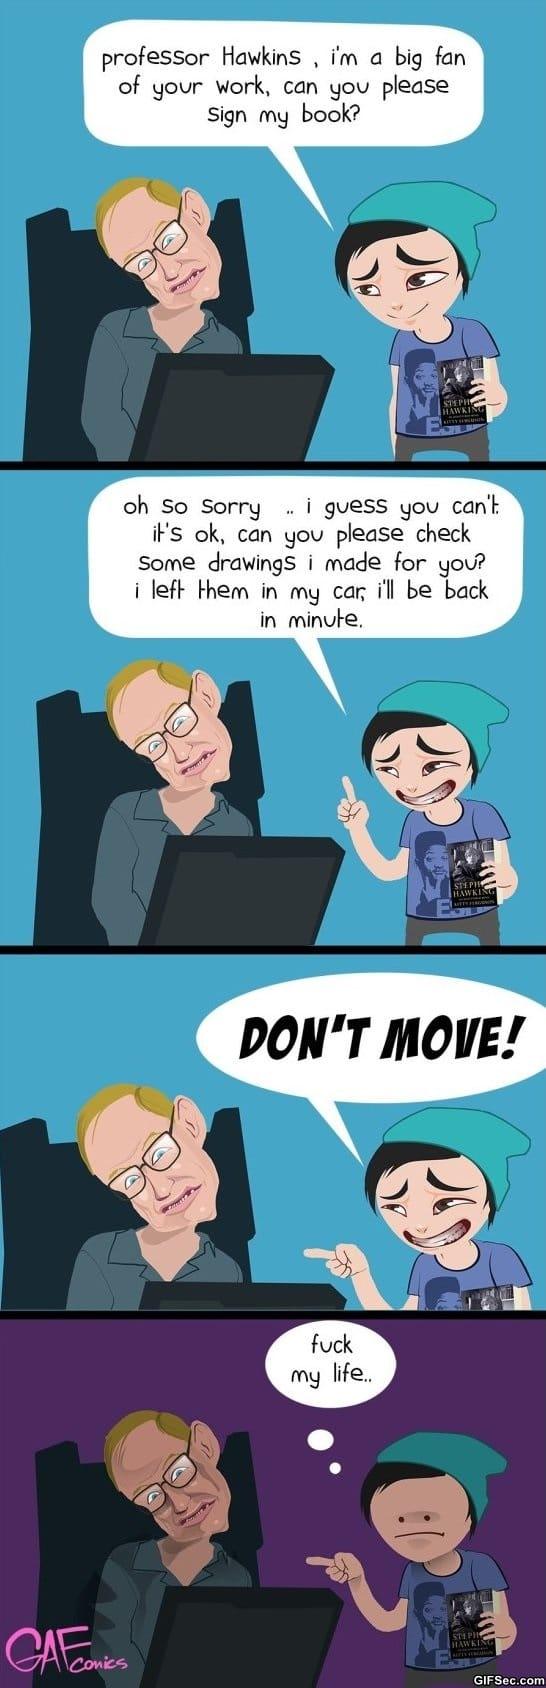 funny-pics-stephen-hawking-humor-meme